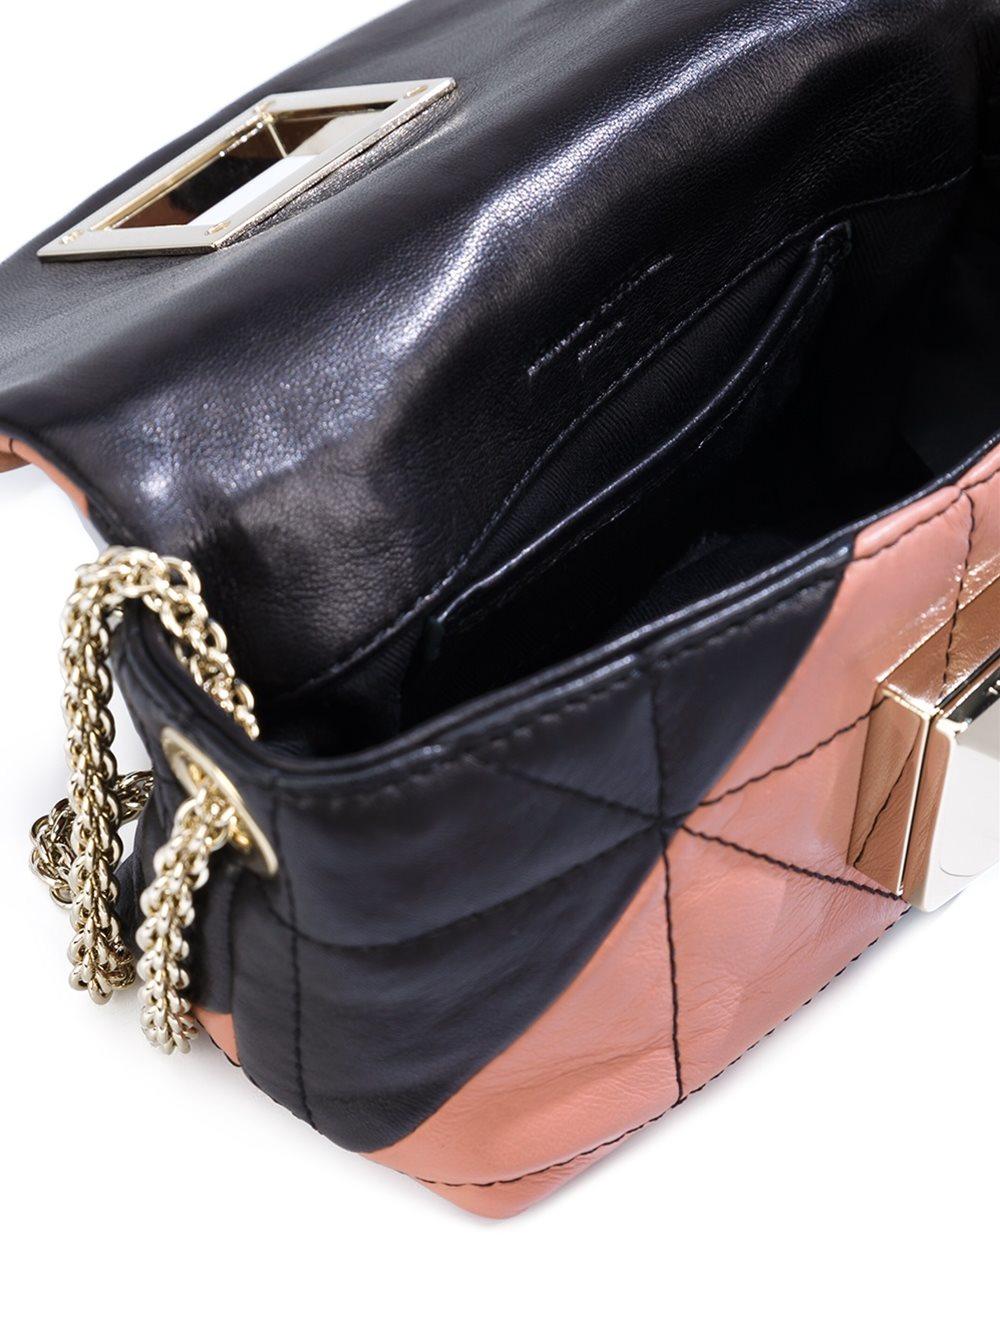 Sonia Rykiel Leather Chain Strap Mini Crossbody Bag In